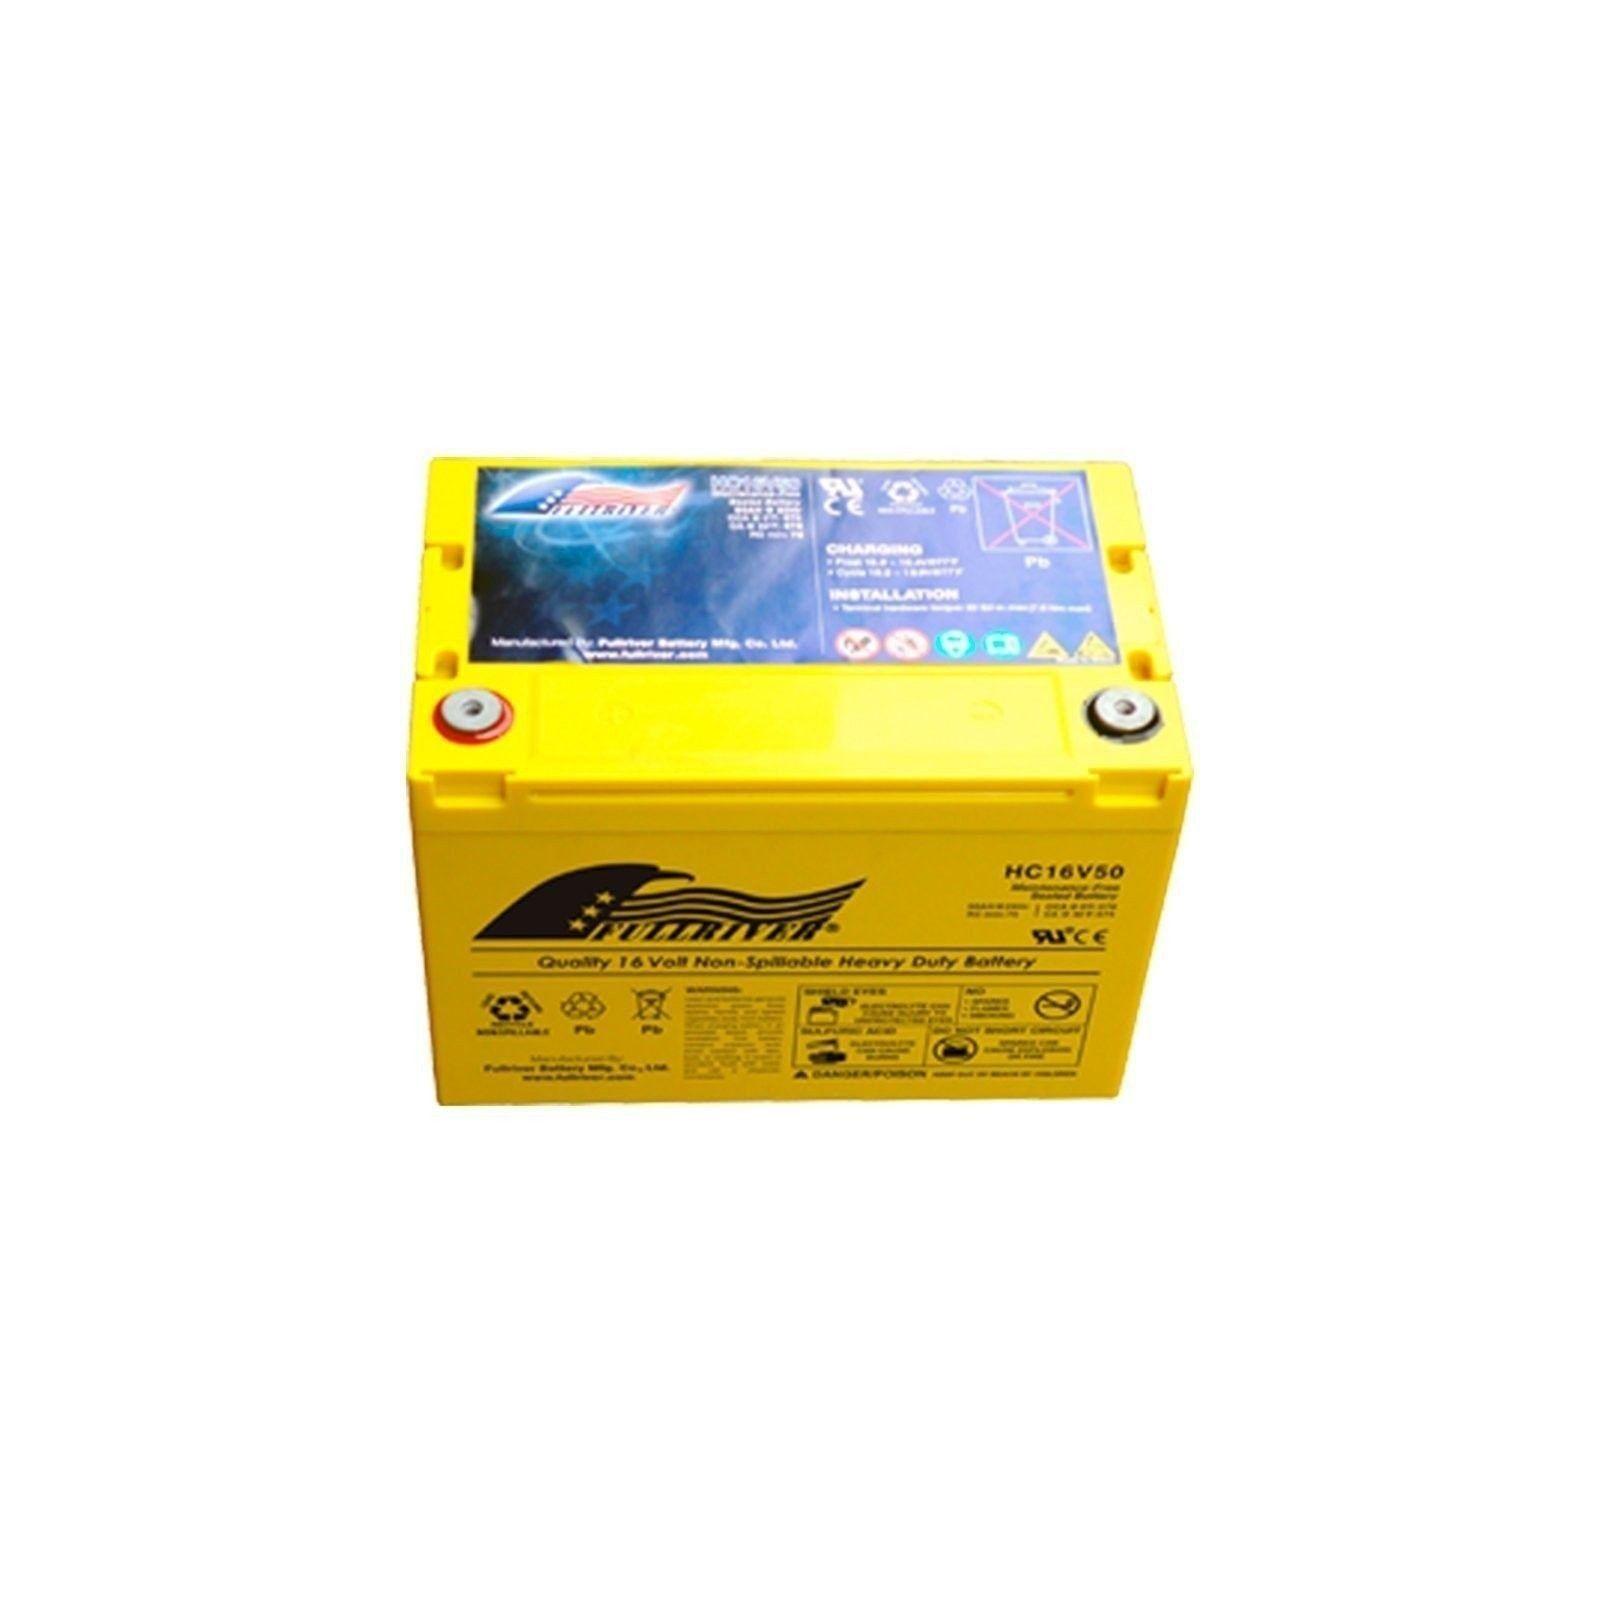 Battery Fullriver HC16V50 50Ah 570A 16V Hc FULLRIVER - 1